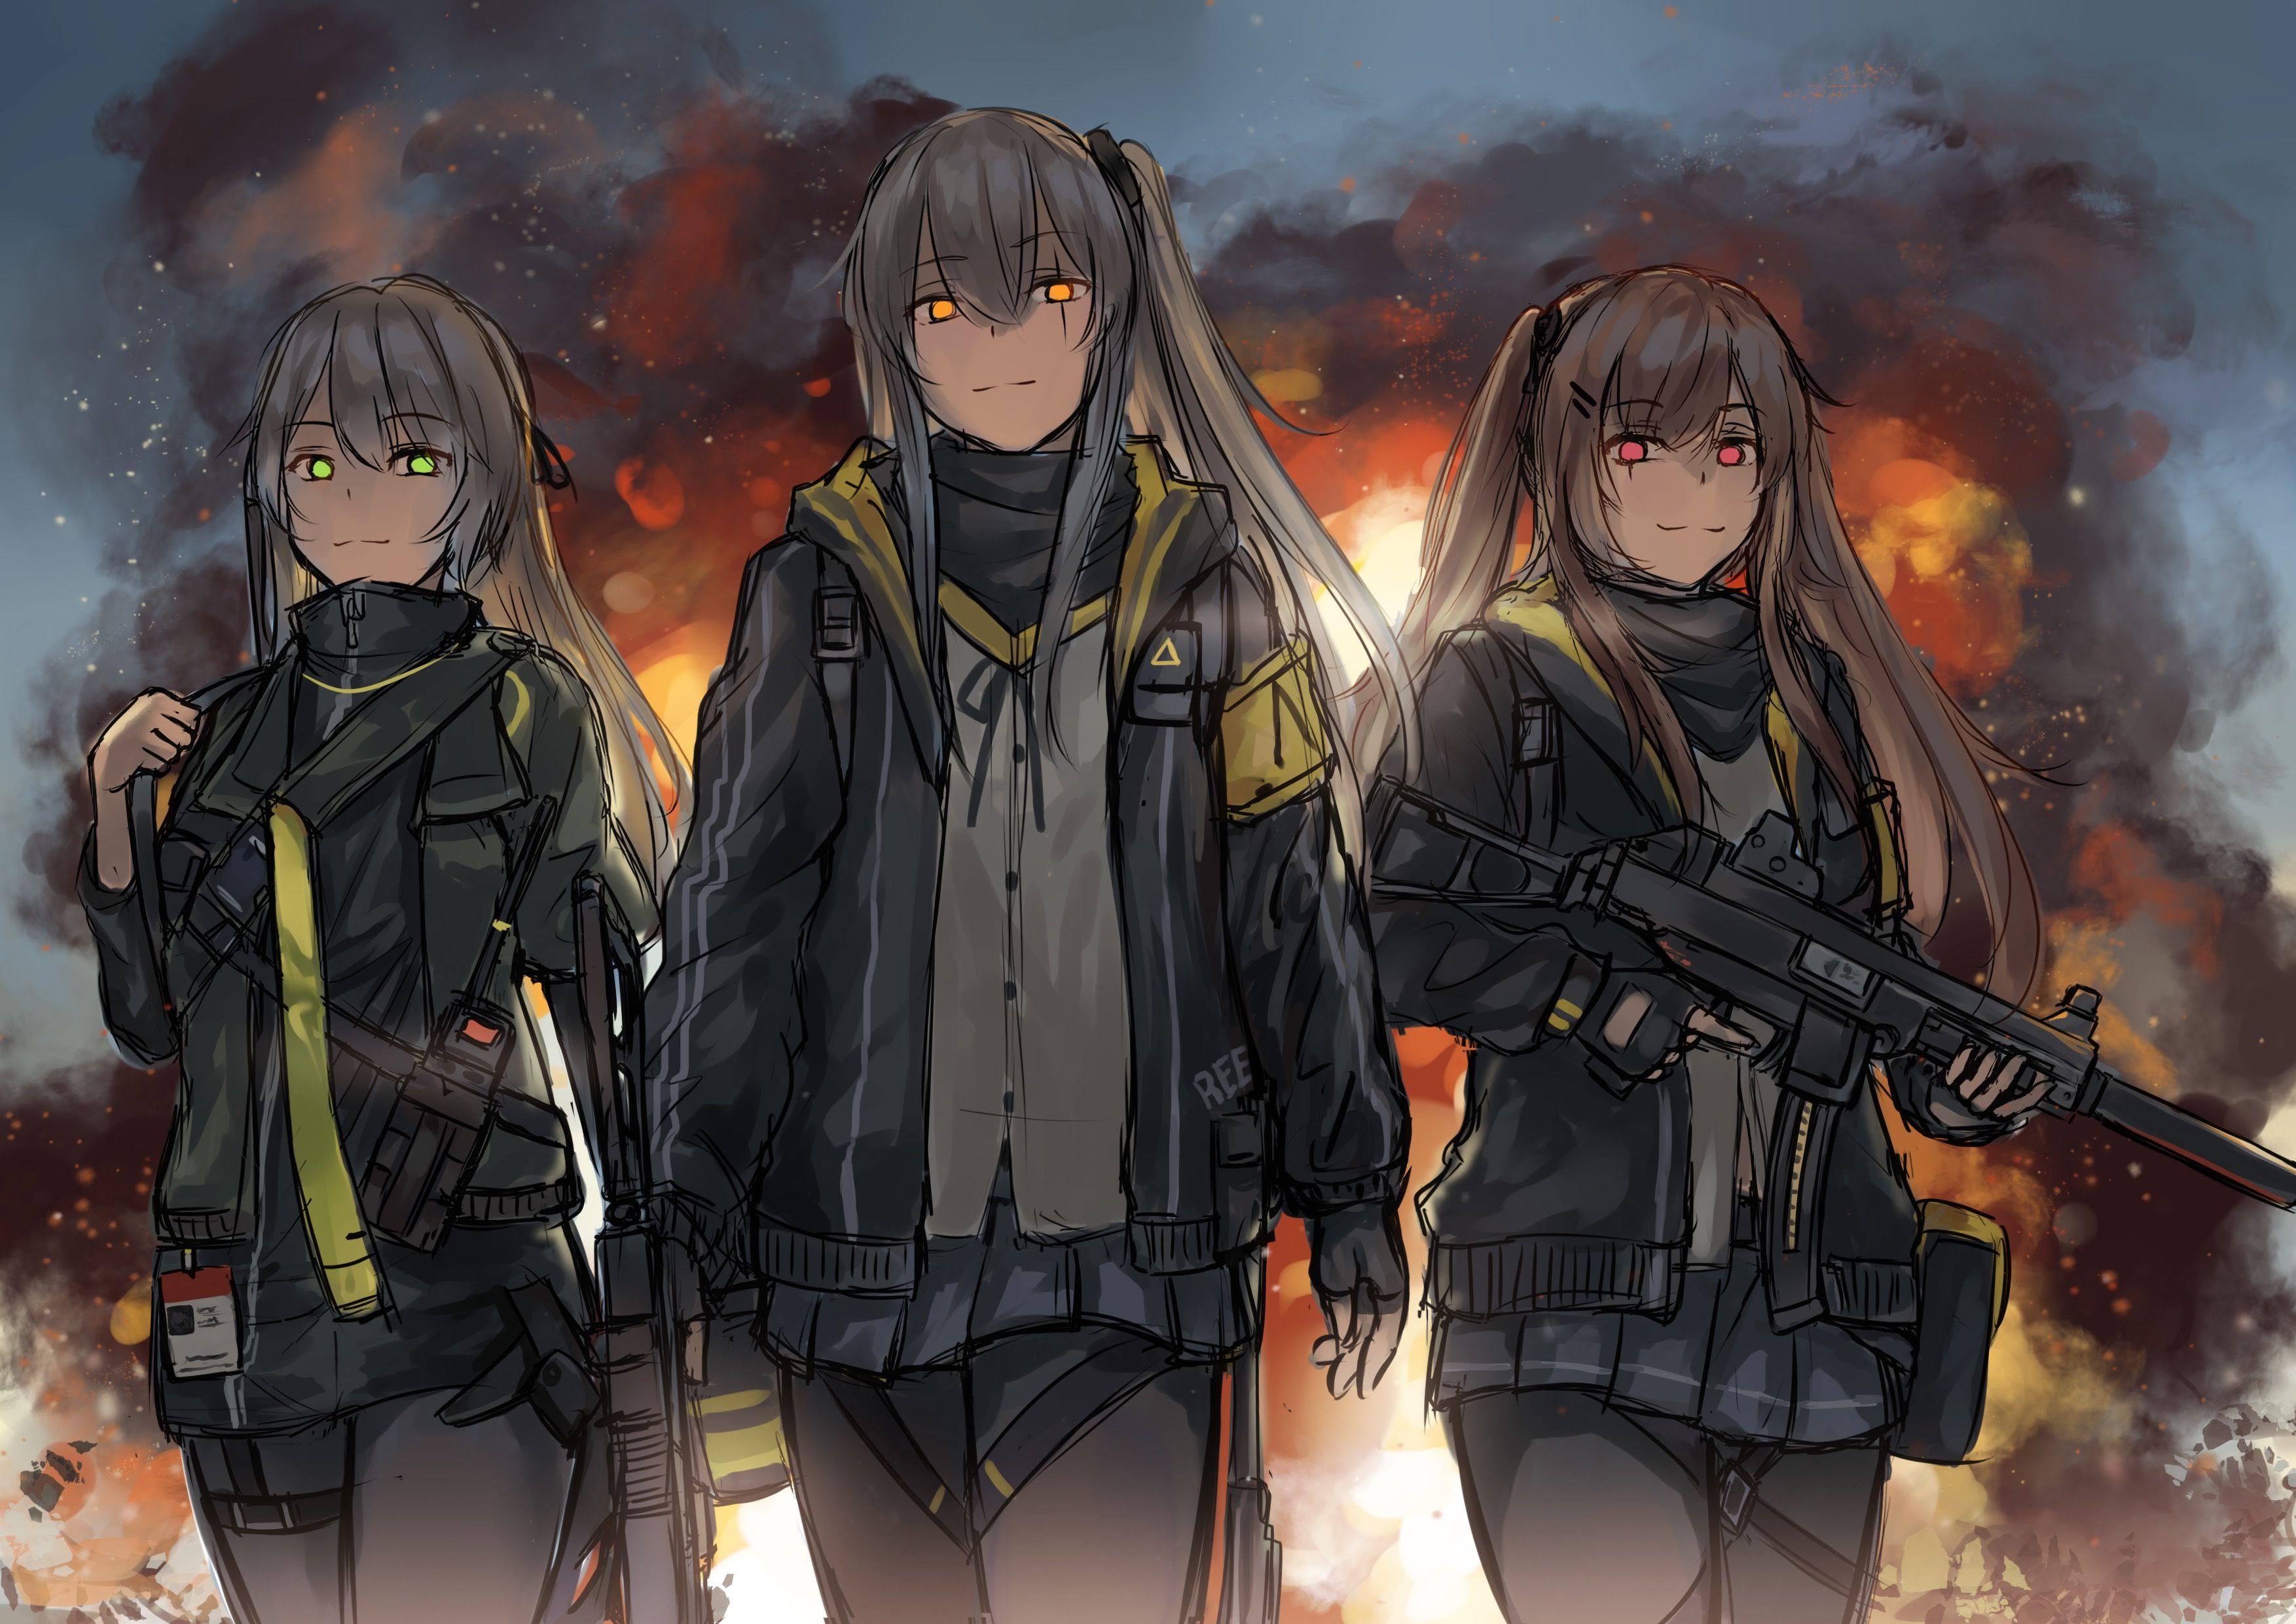 /m4a1 (girls frontline) | yande.re